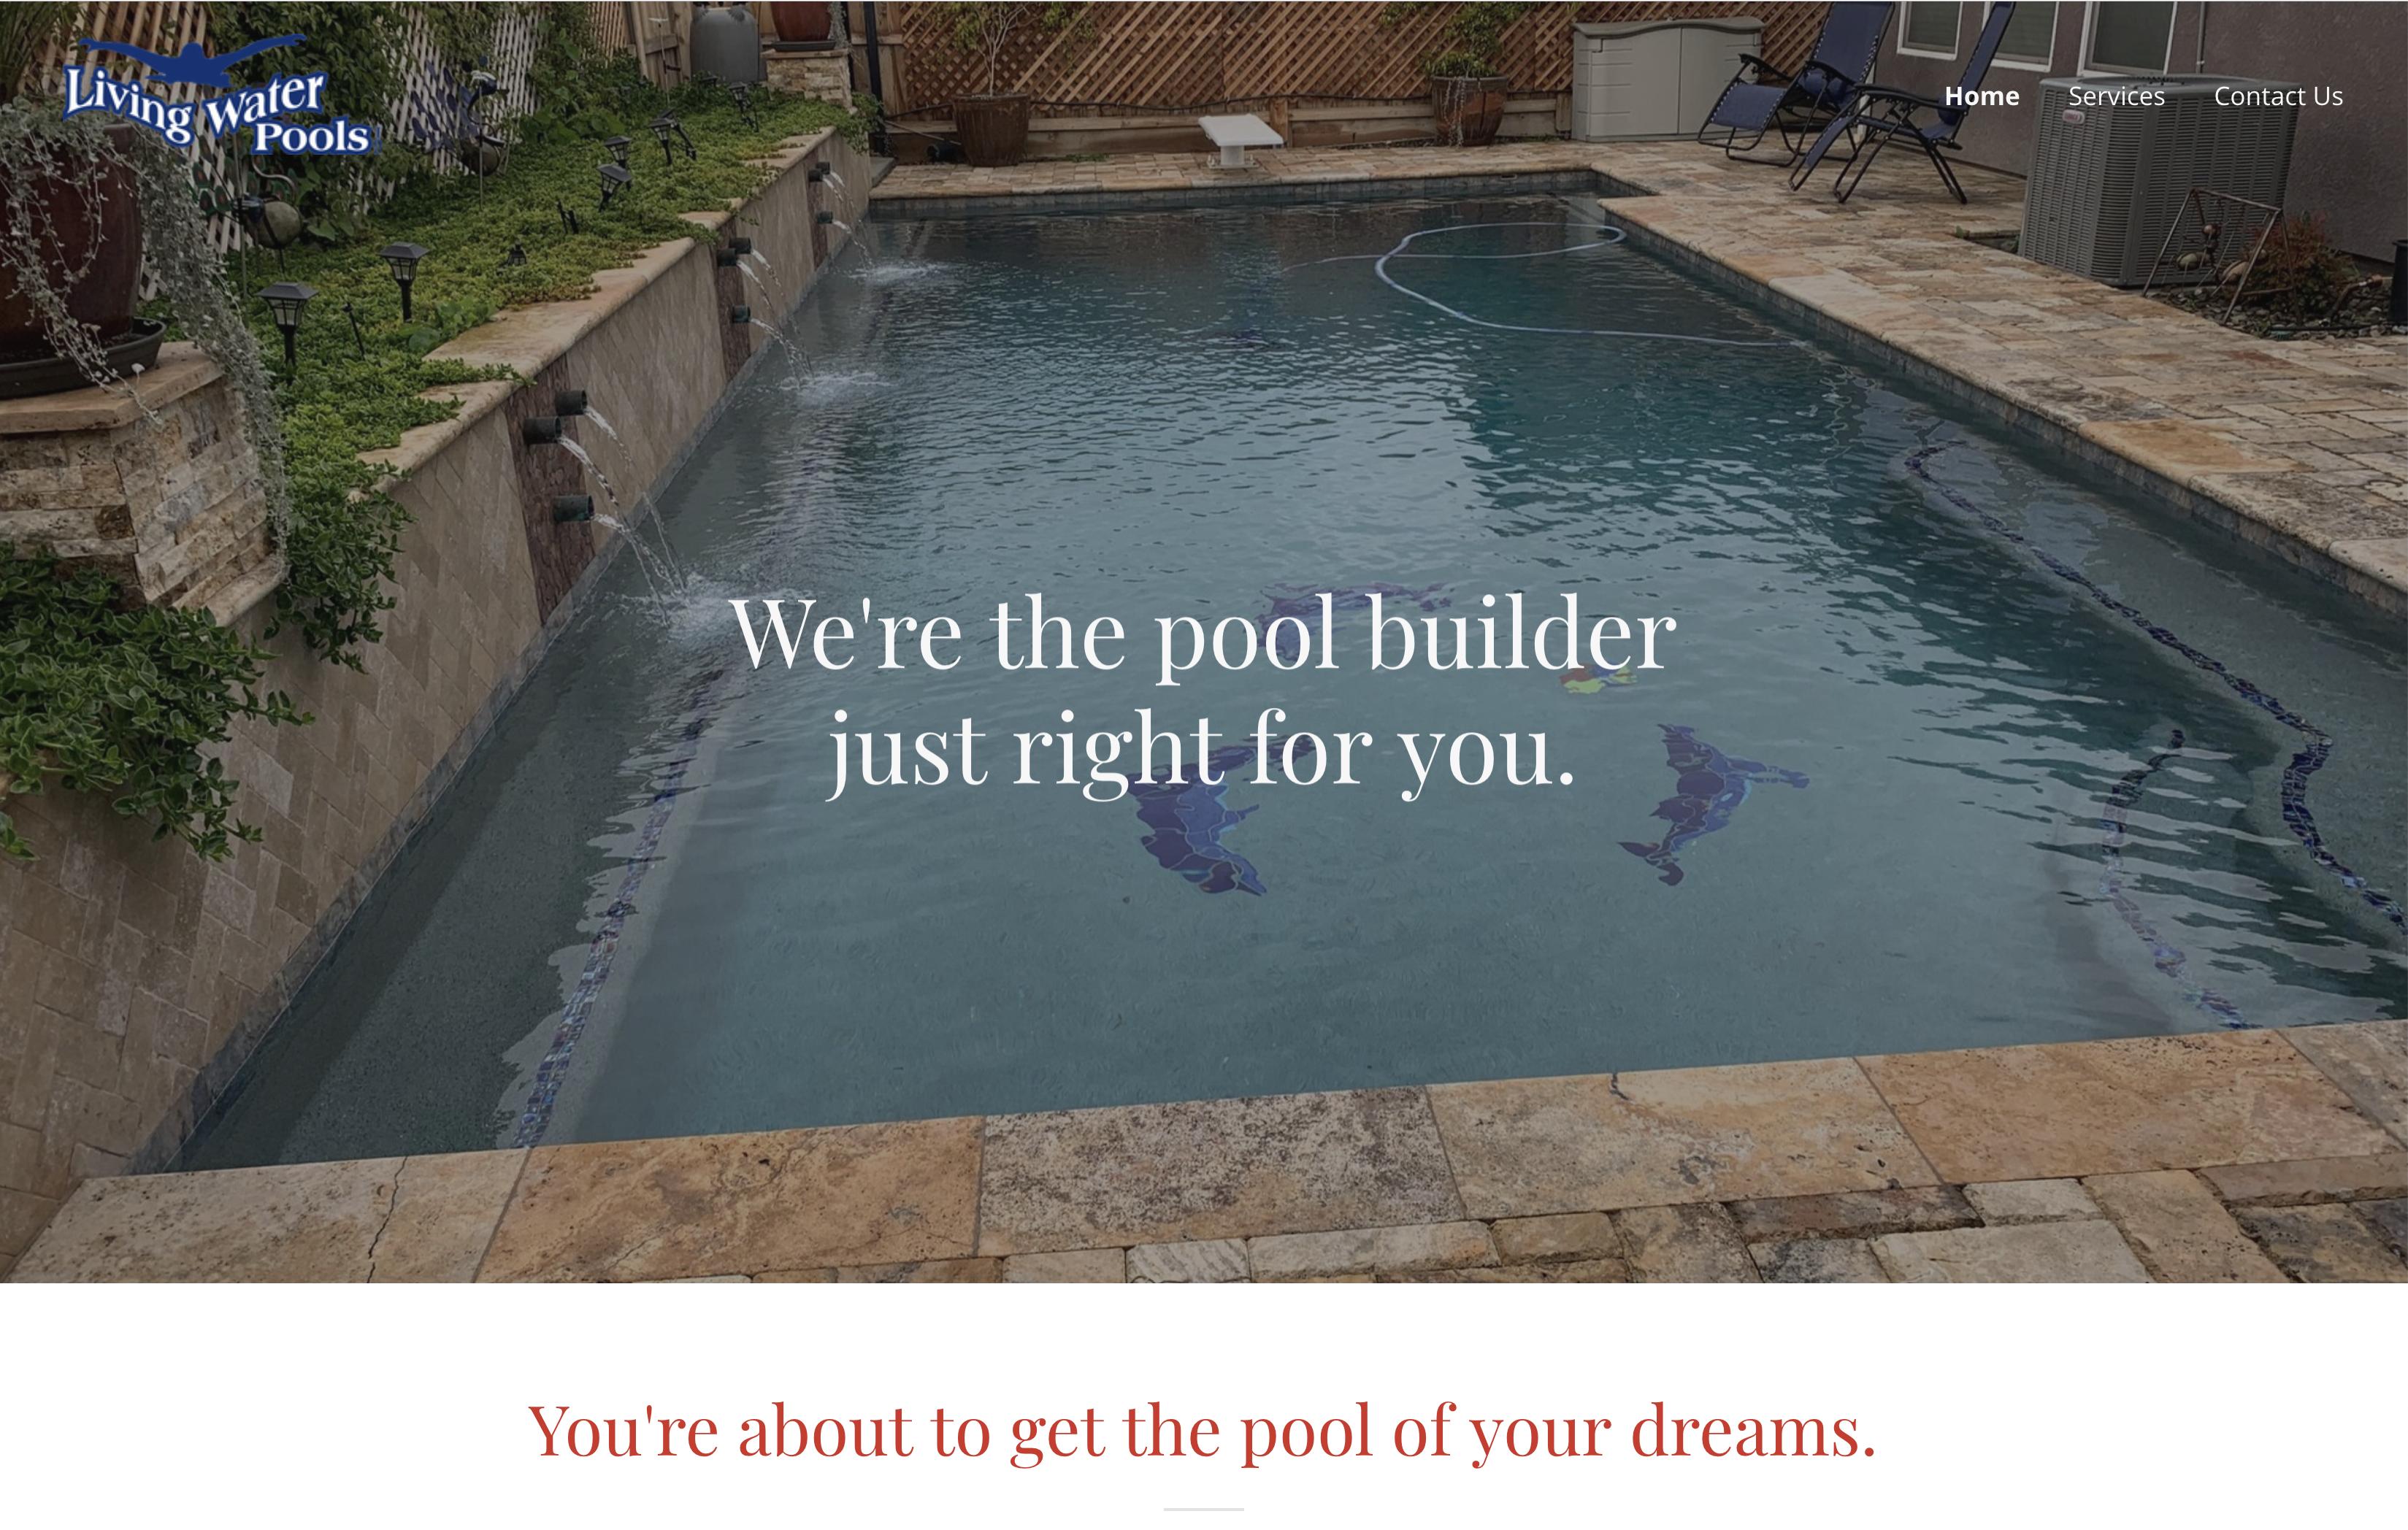 Living Water Pools